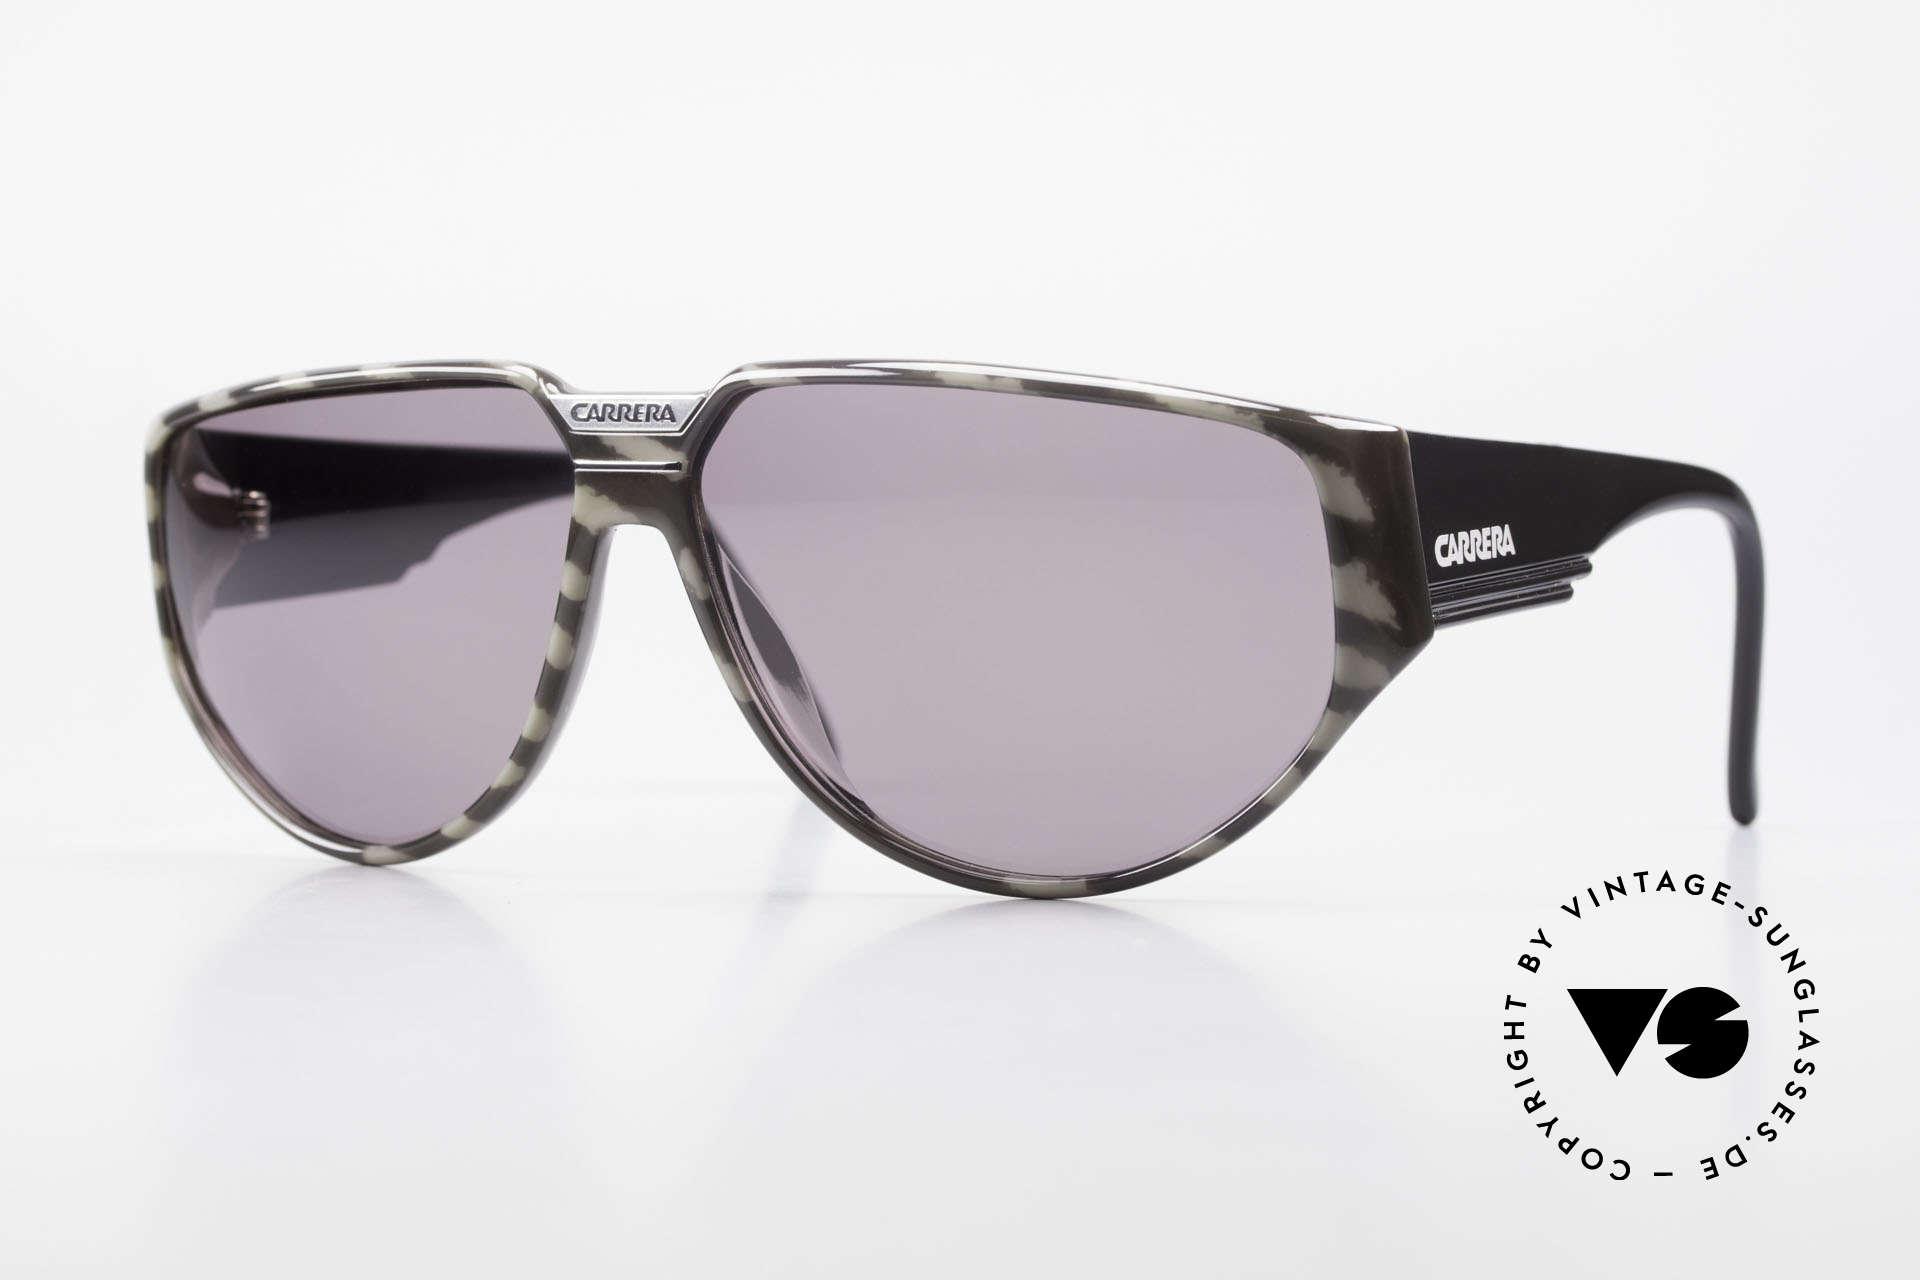 Carrera 5417 Camouflage 80's Sportsglasses, old, original Carrera sports sunglasses from 1989, Made for Men